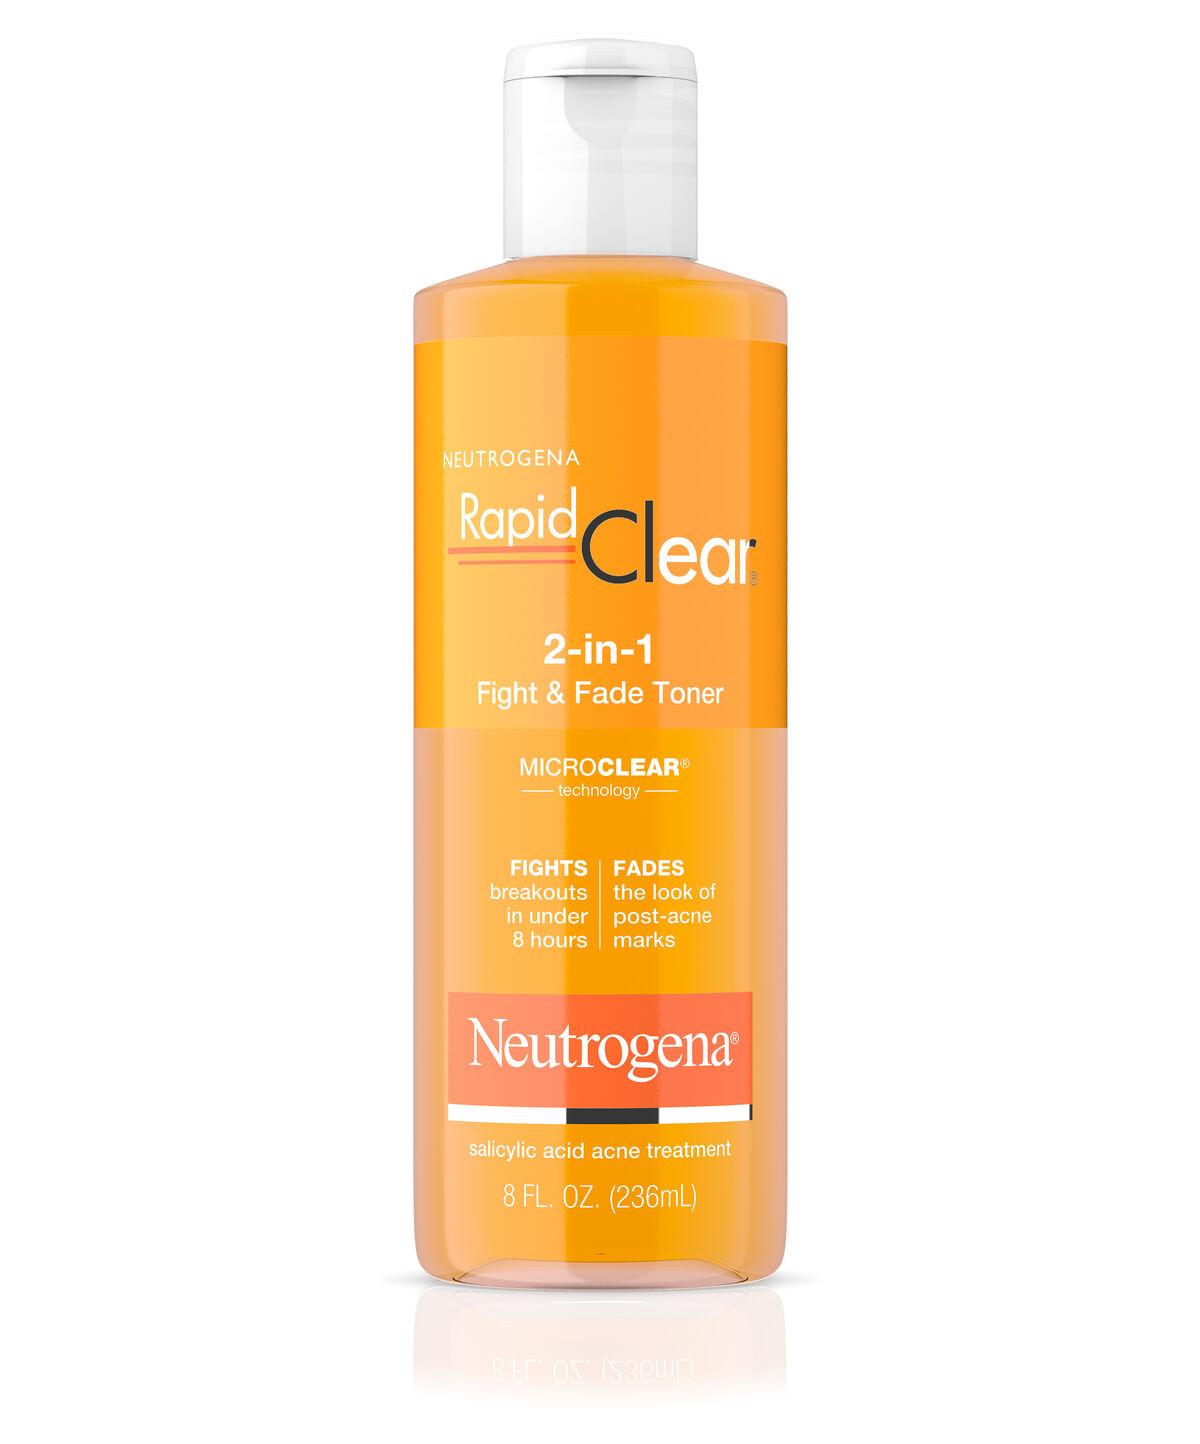 Neutrogena rapid clear 2 in 1 fight fade toner neutrogena neutrogena rapid clear 2 in 1 fight fade toner ccuart Gallery